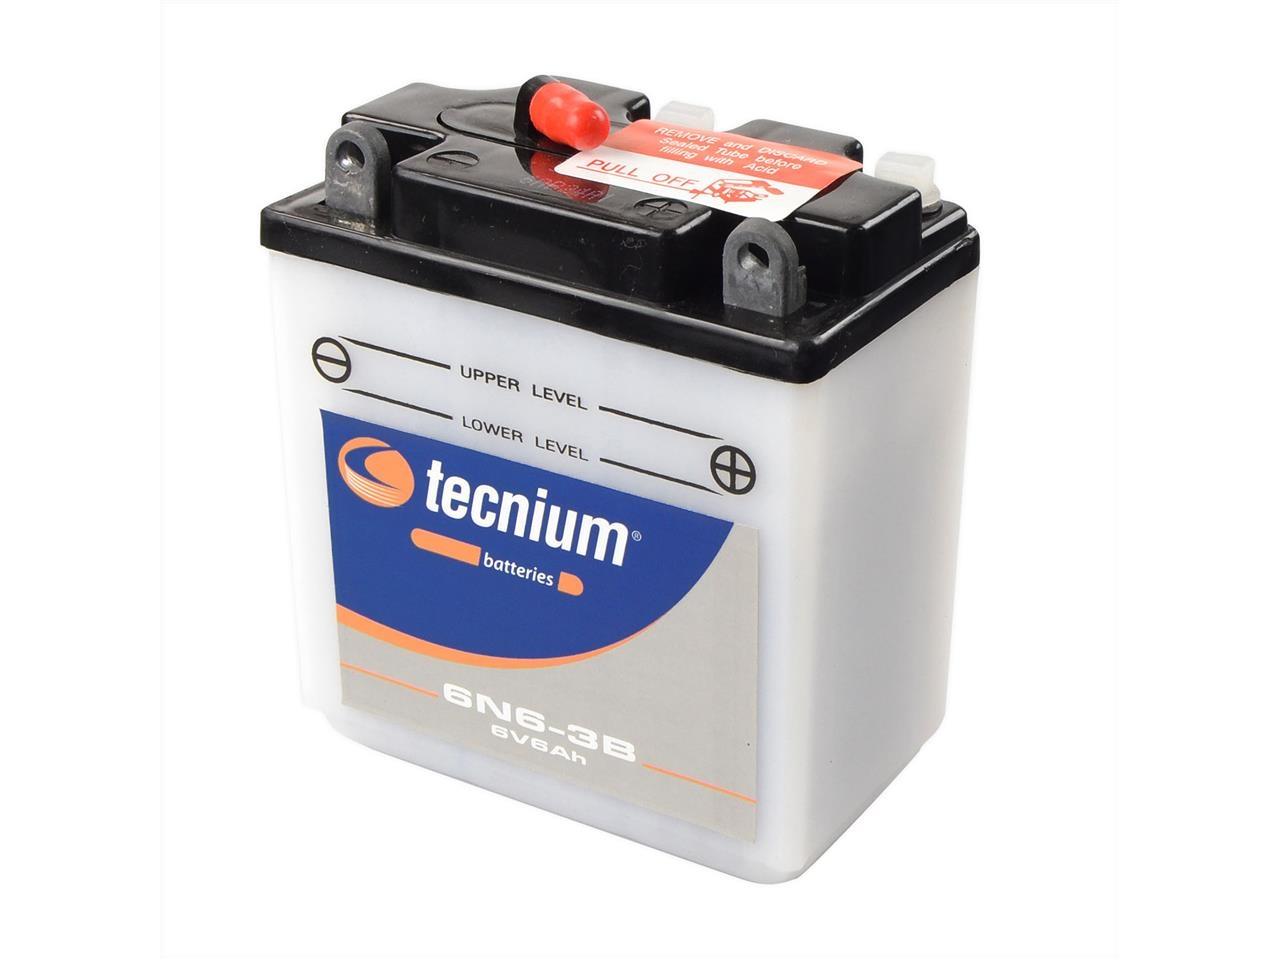 Batterie Tecnium 6N6-3B 6V 6 Ah